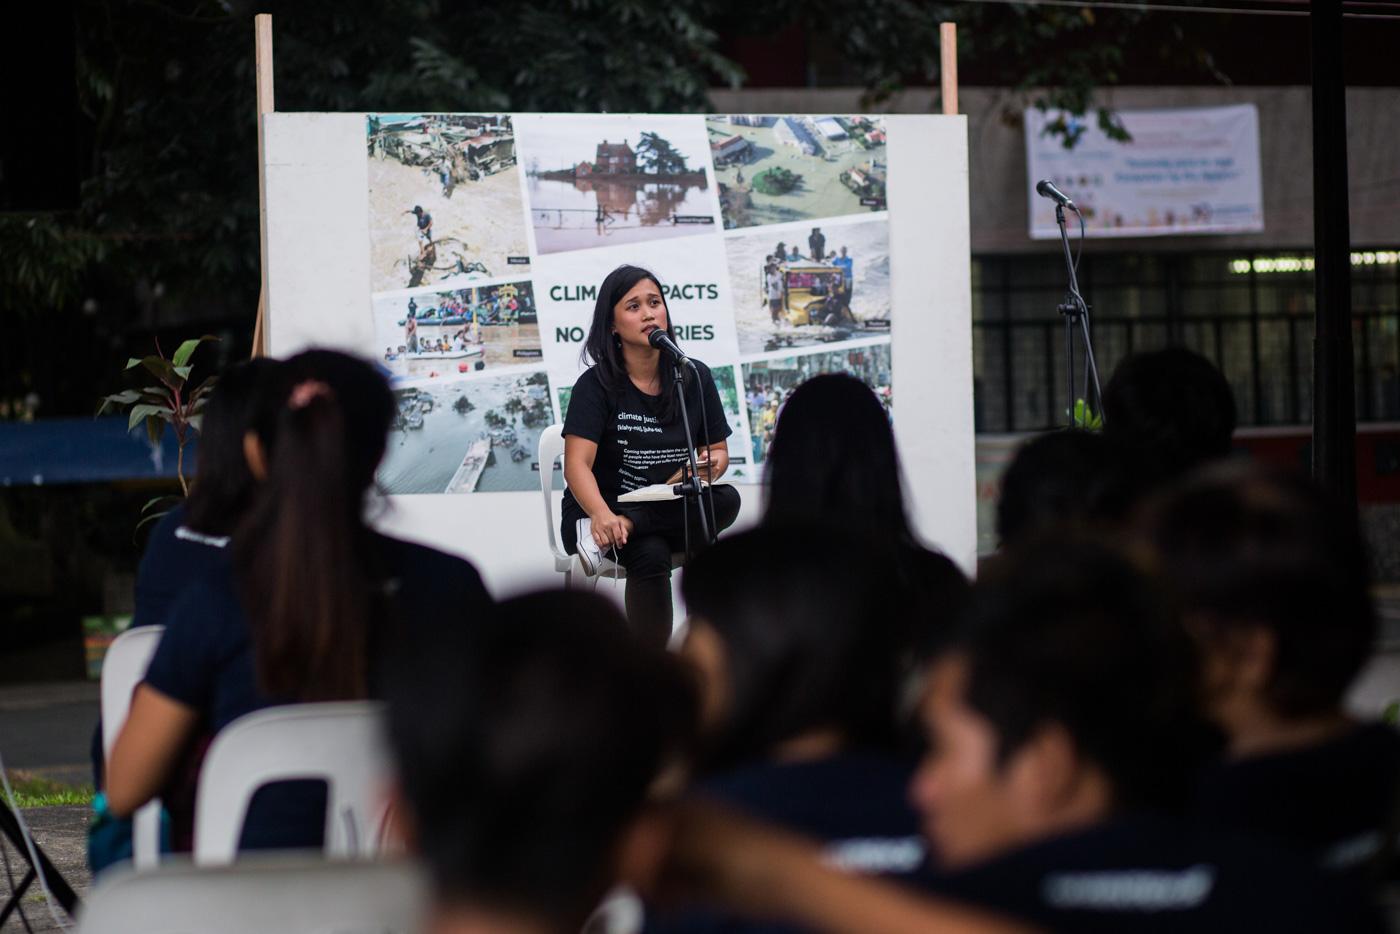 YOLANDA EXPERIENCE. Joanna Sustento shares her experience during Super Typhoon Yolanda (Haiyan) during the vigil. Photo by Geric Cruz/Greenpeace